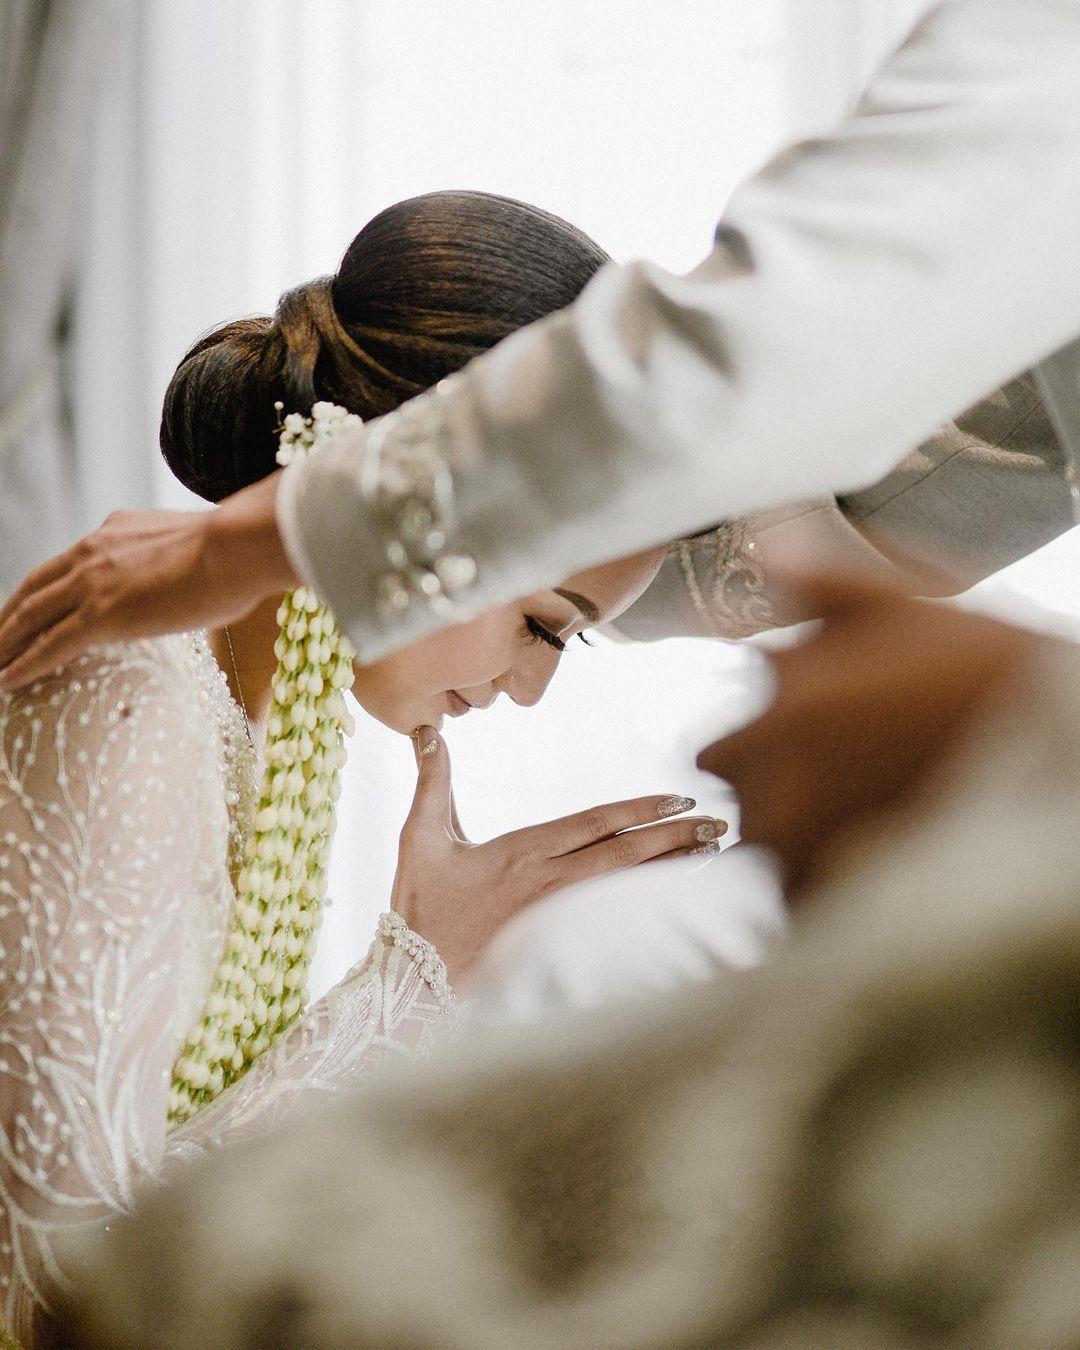 Keuntungan Menyelenggarakan Micro Wedding di Era Pandemi